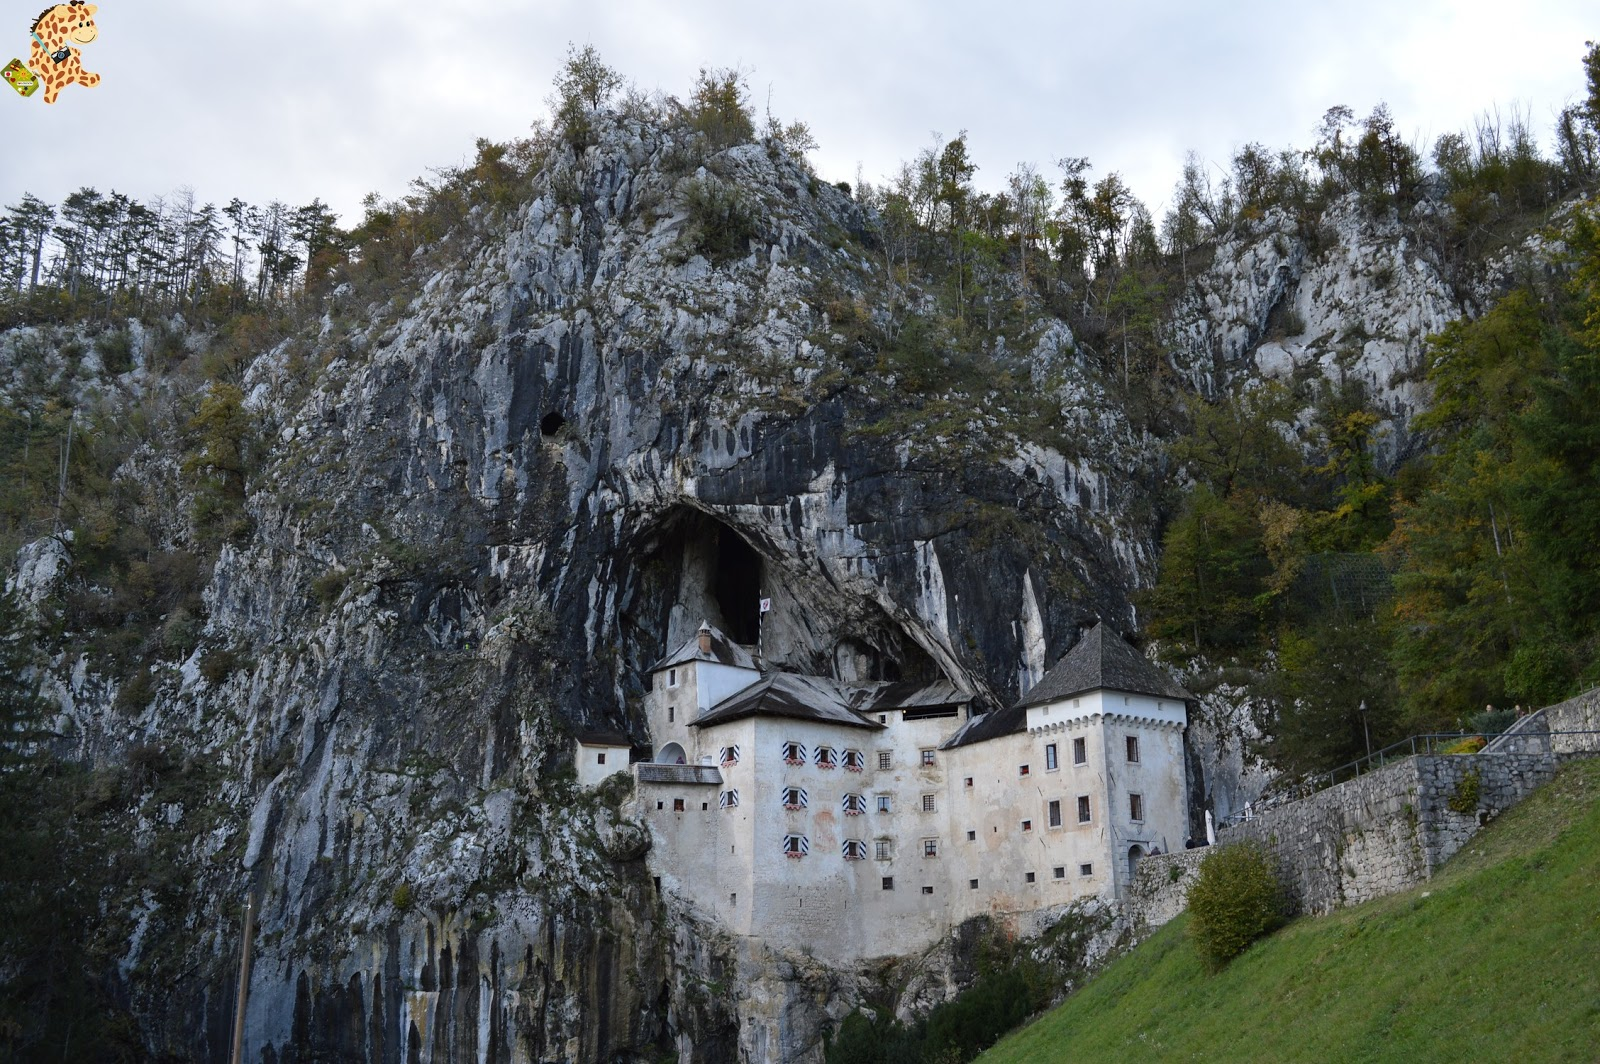 queverenesloveniaen4dias28I29282129 - Cuevas de Skocjan y Postojna y castillo de Predjama, Eslovenia